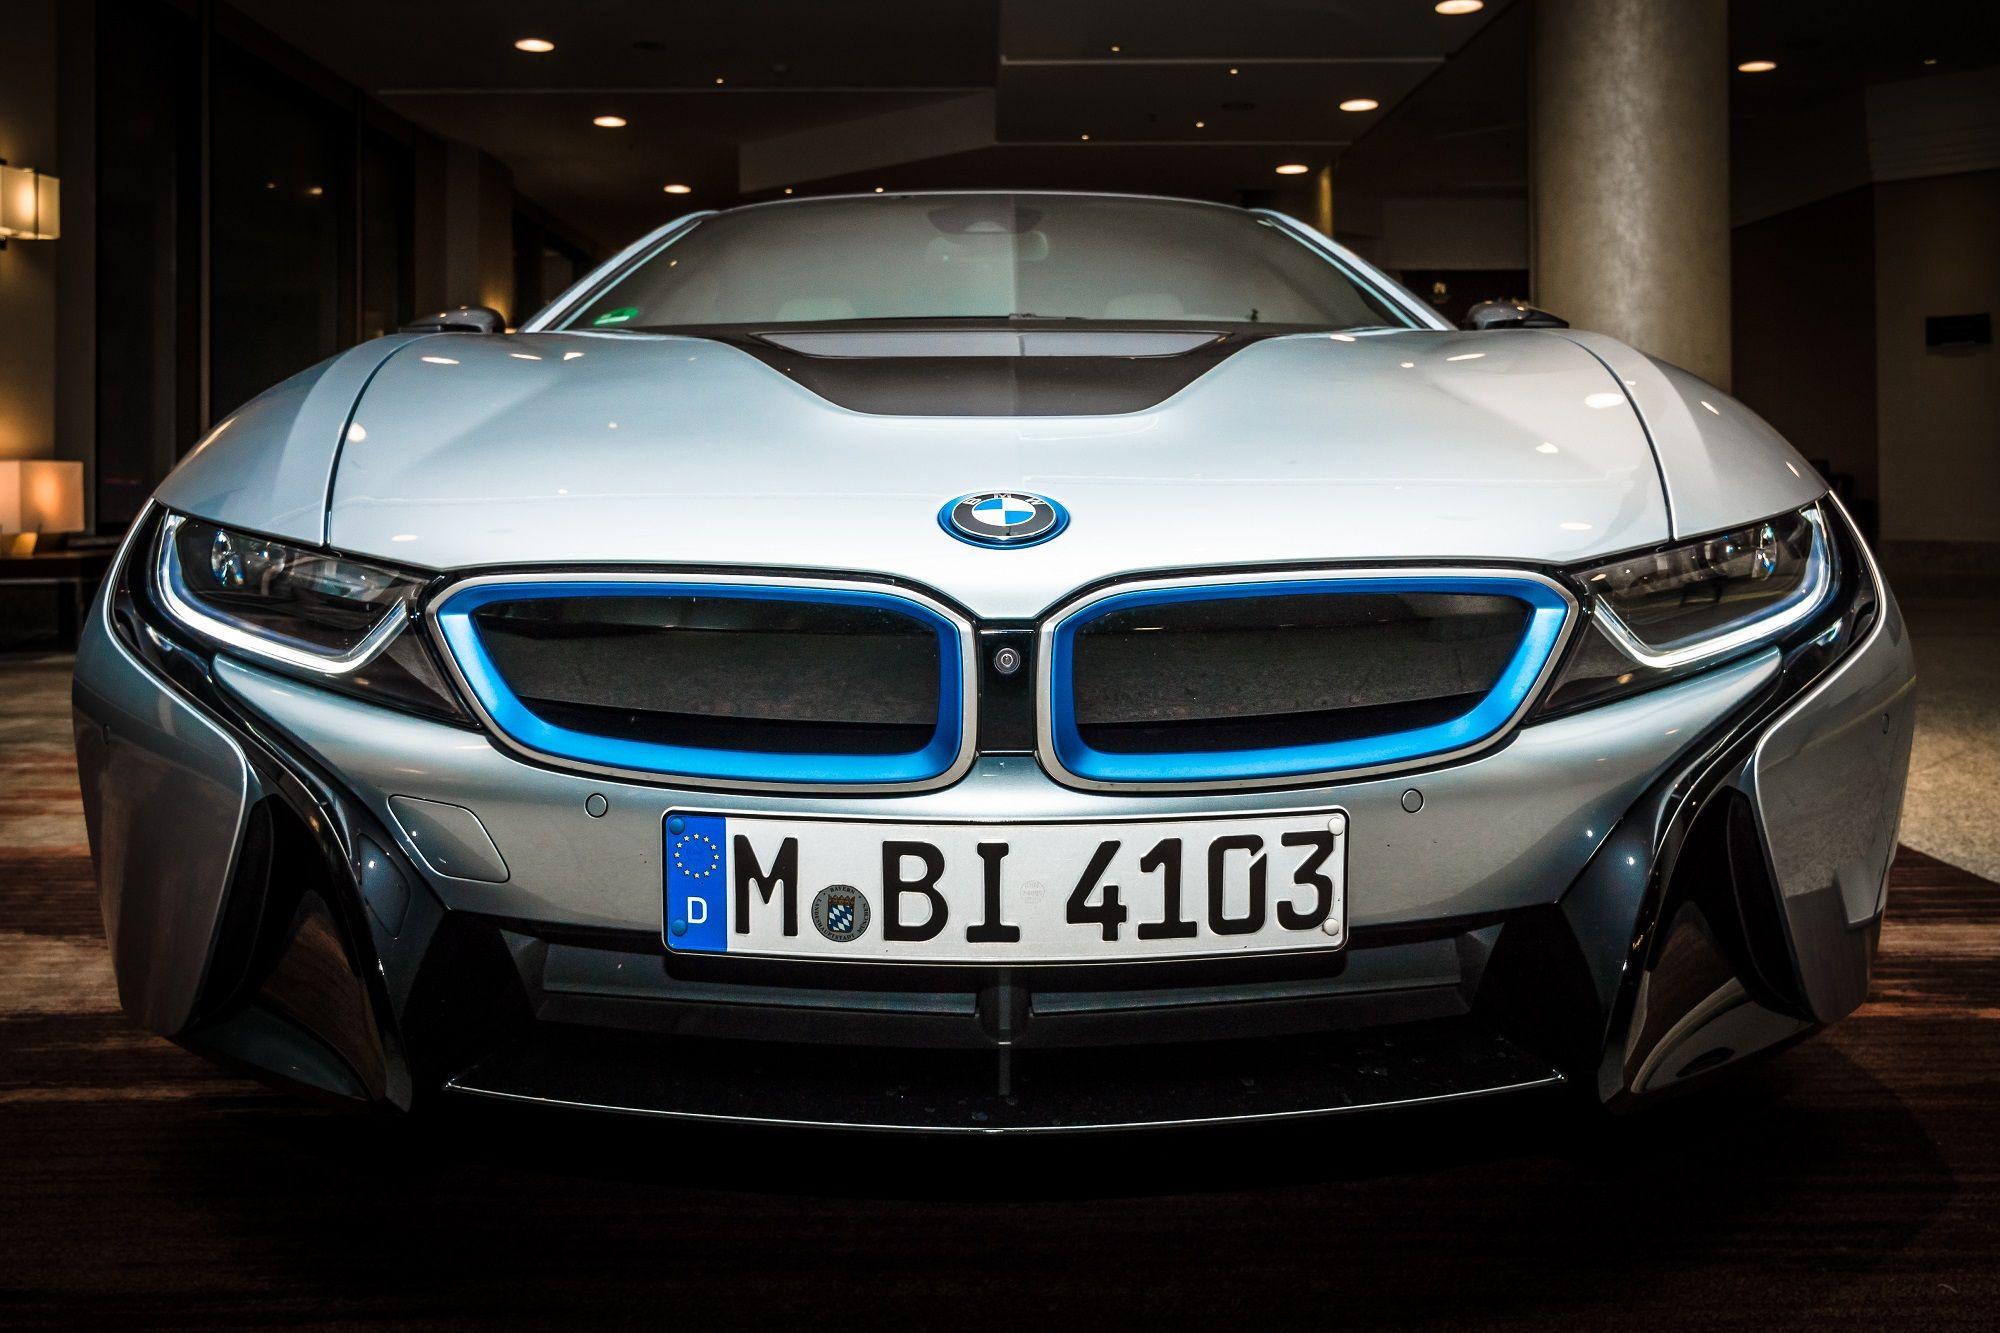 Luxury Vehicle Brands: Top 15 Best Selling Luxury Car Brands In The US